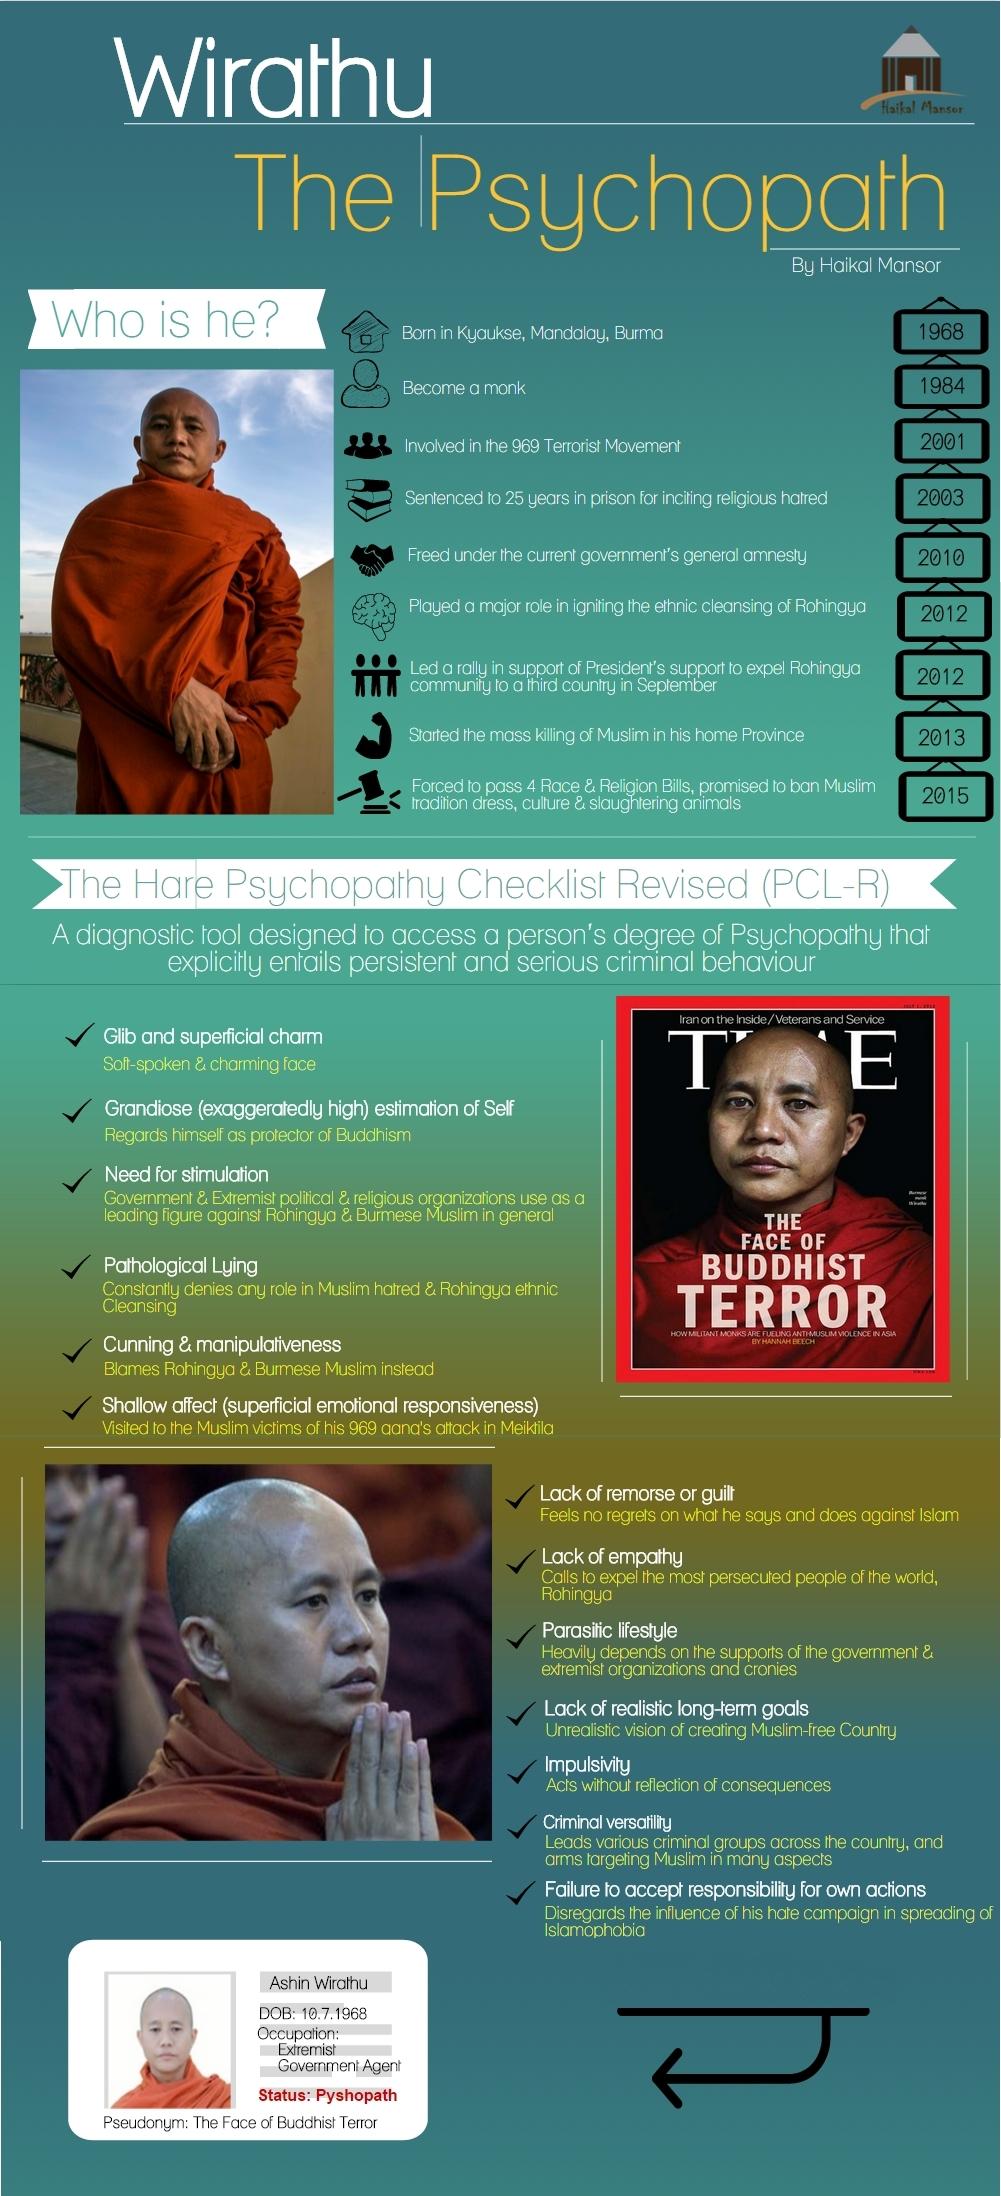 Wirathu Psychopath